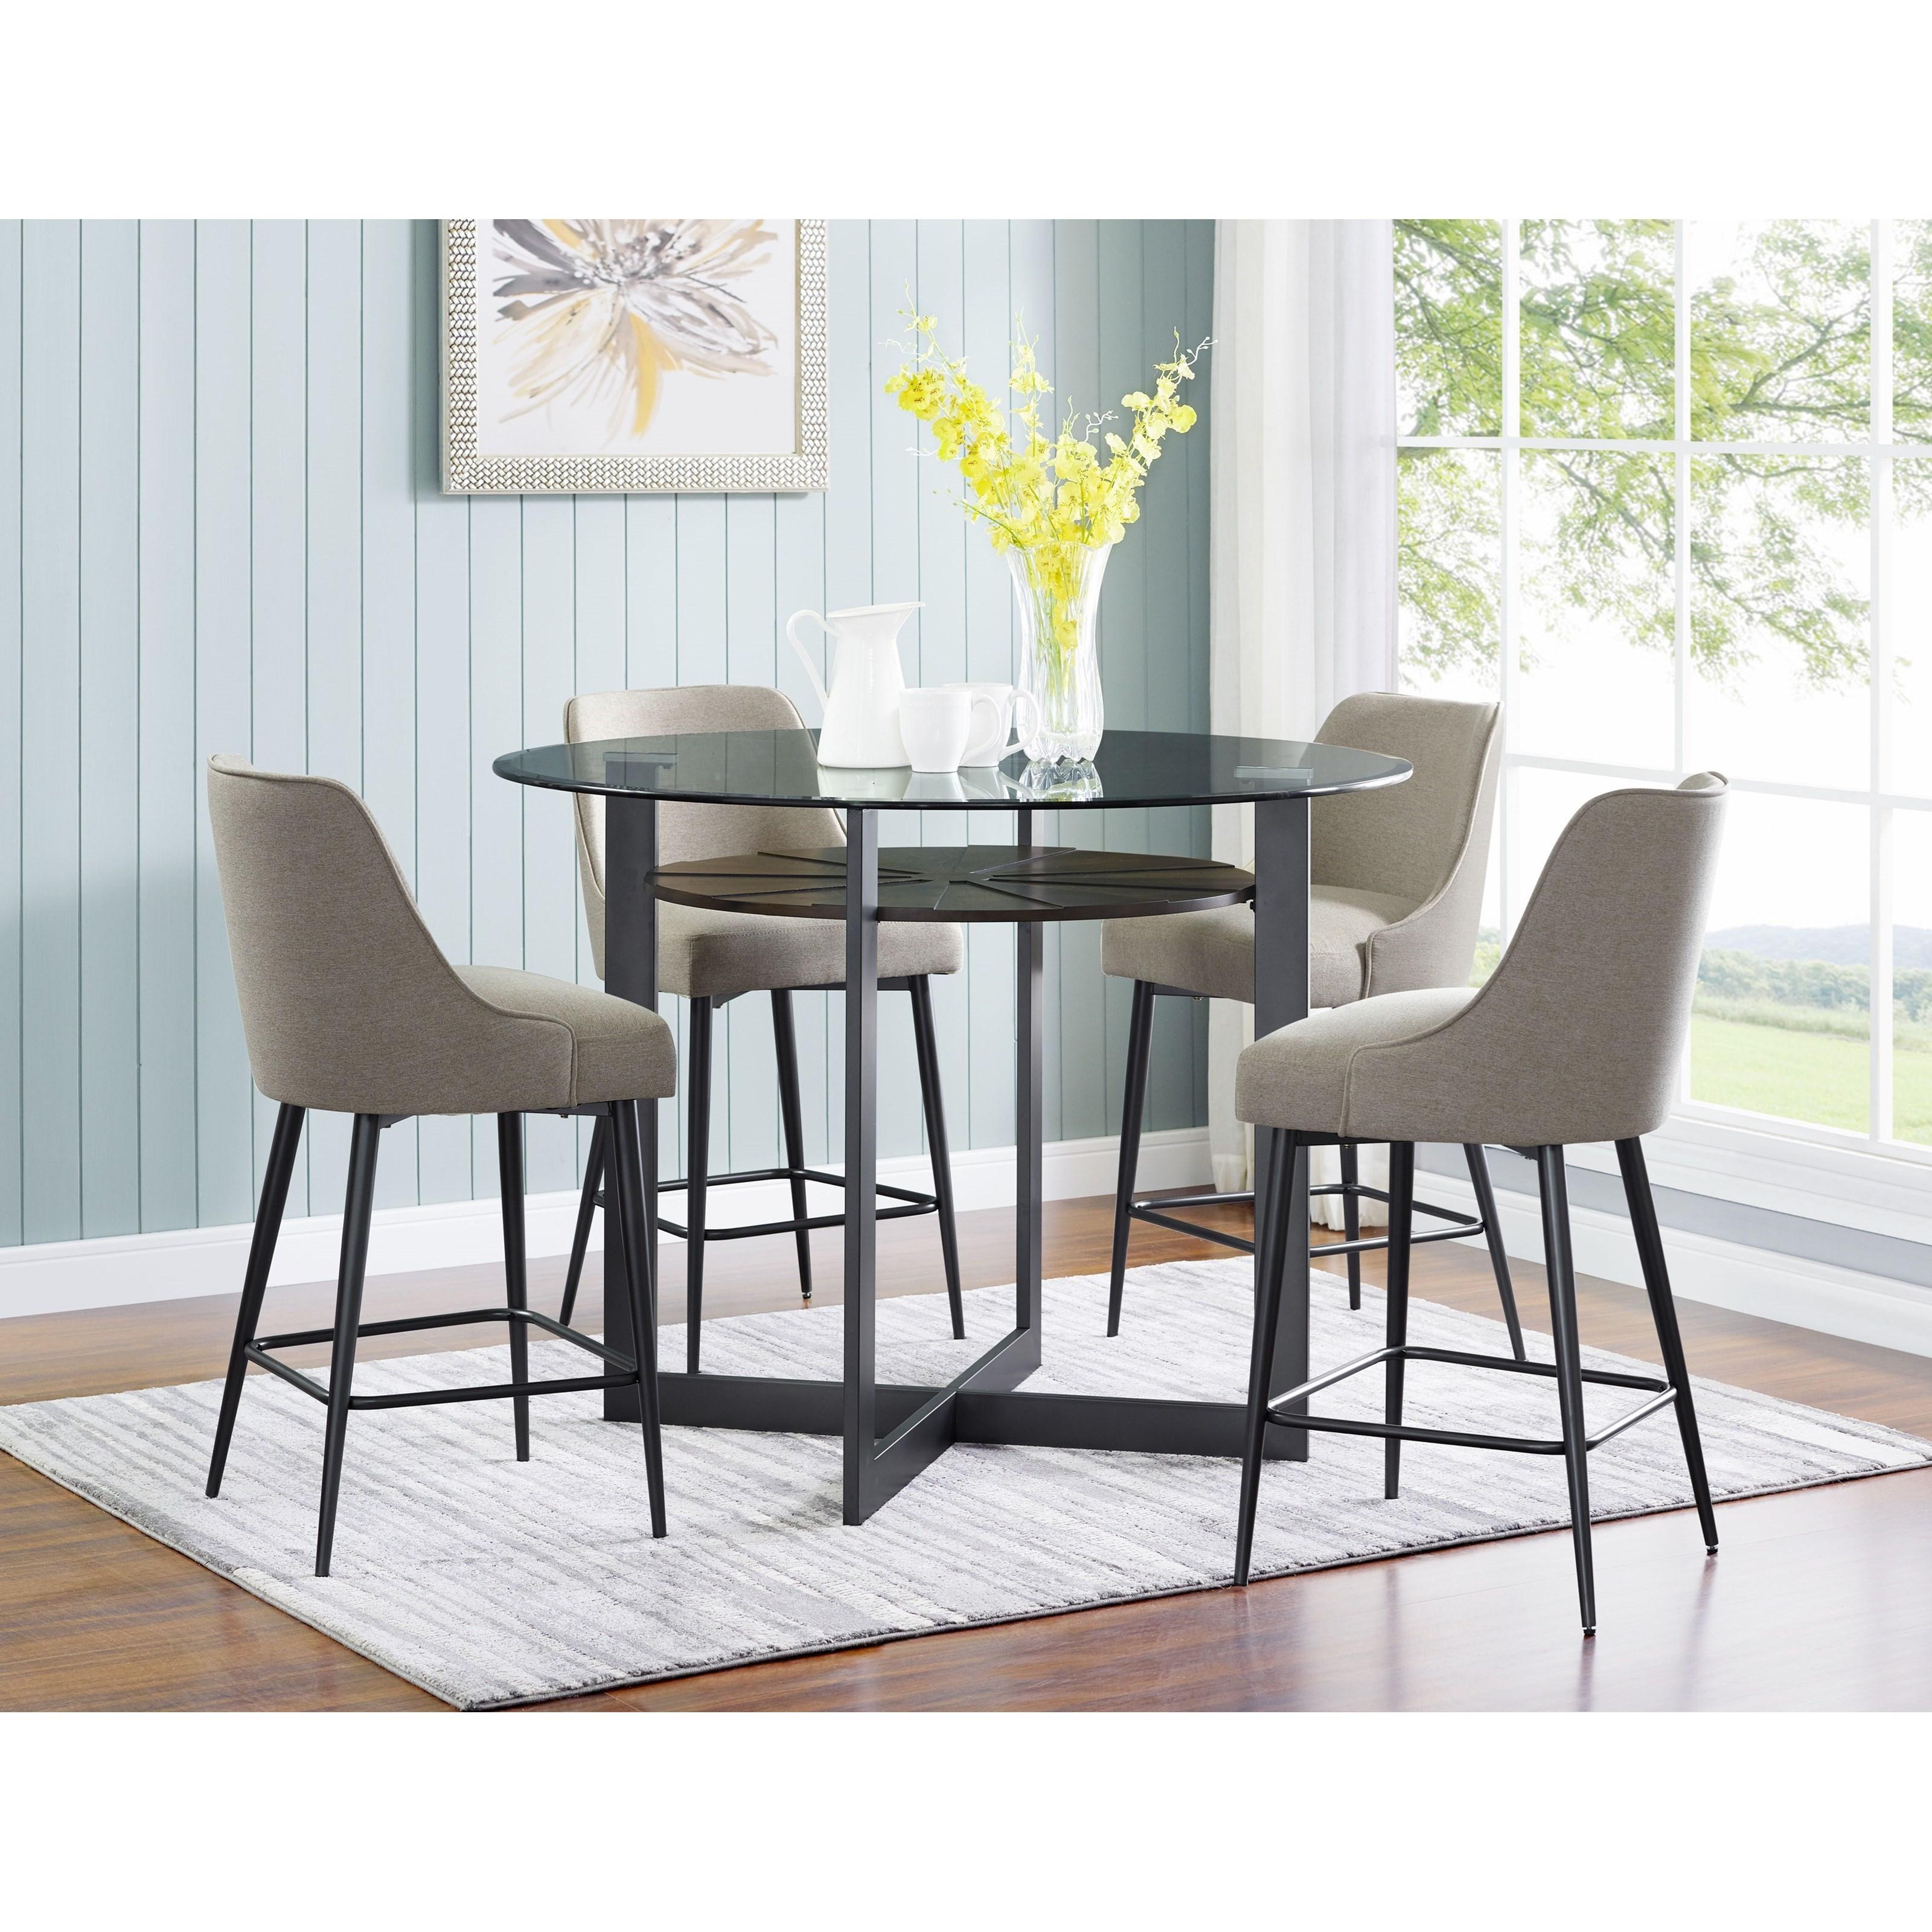 5 Piece Counter Dining Set